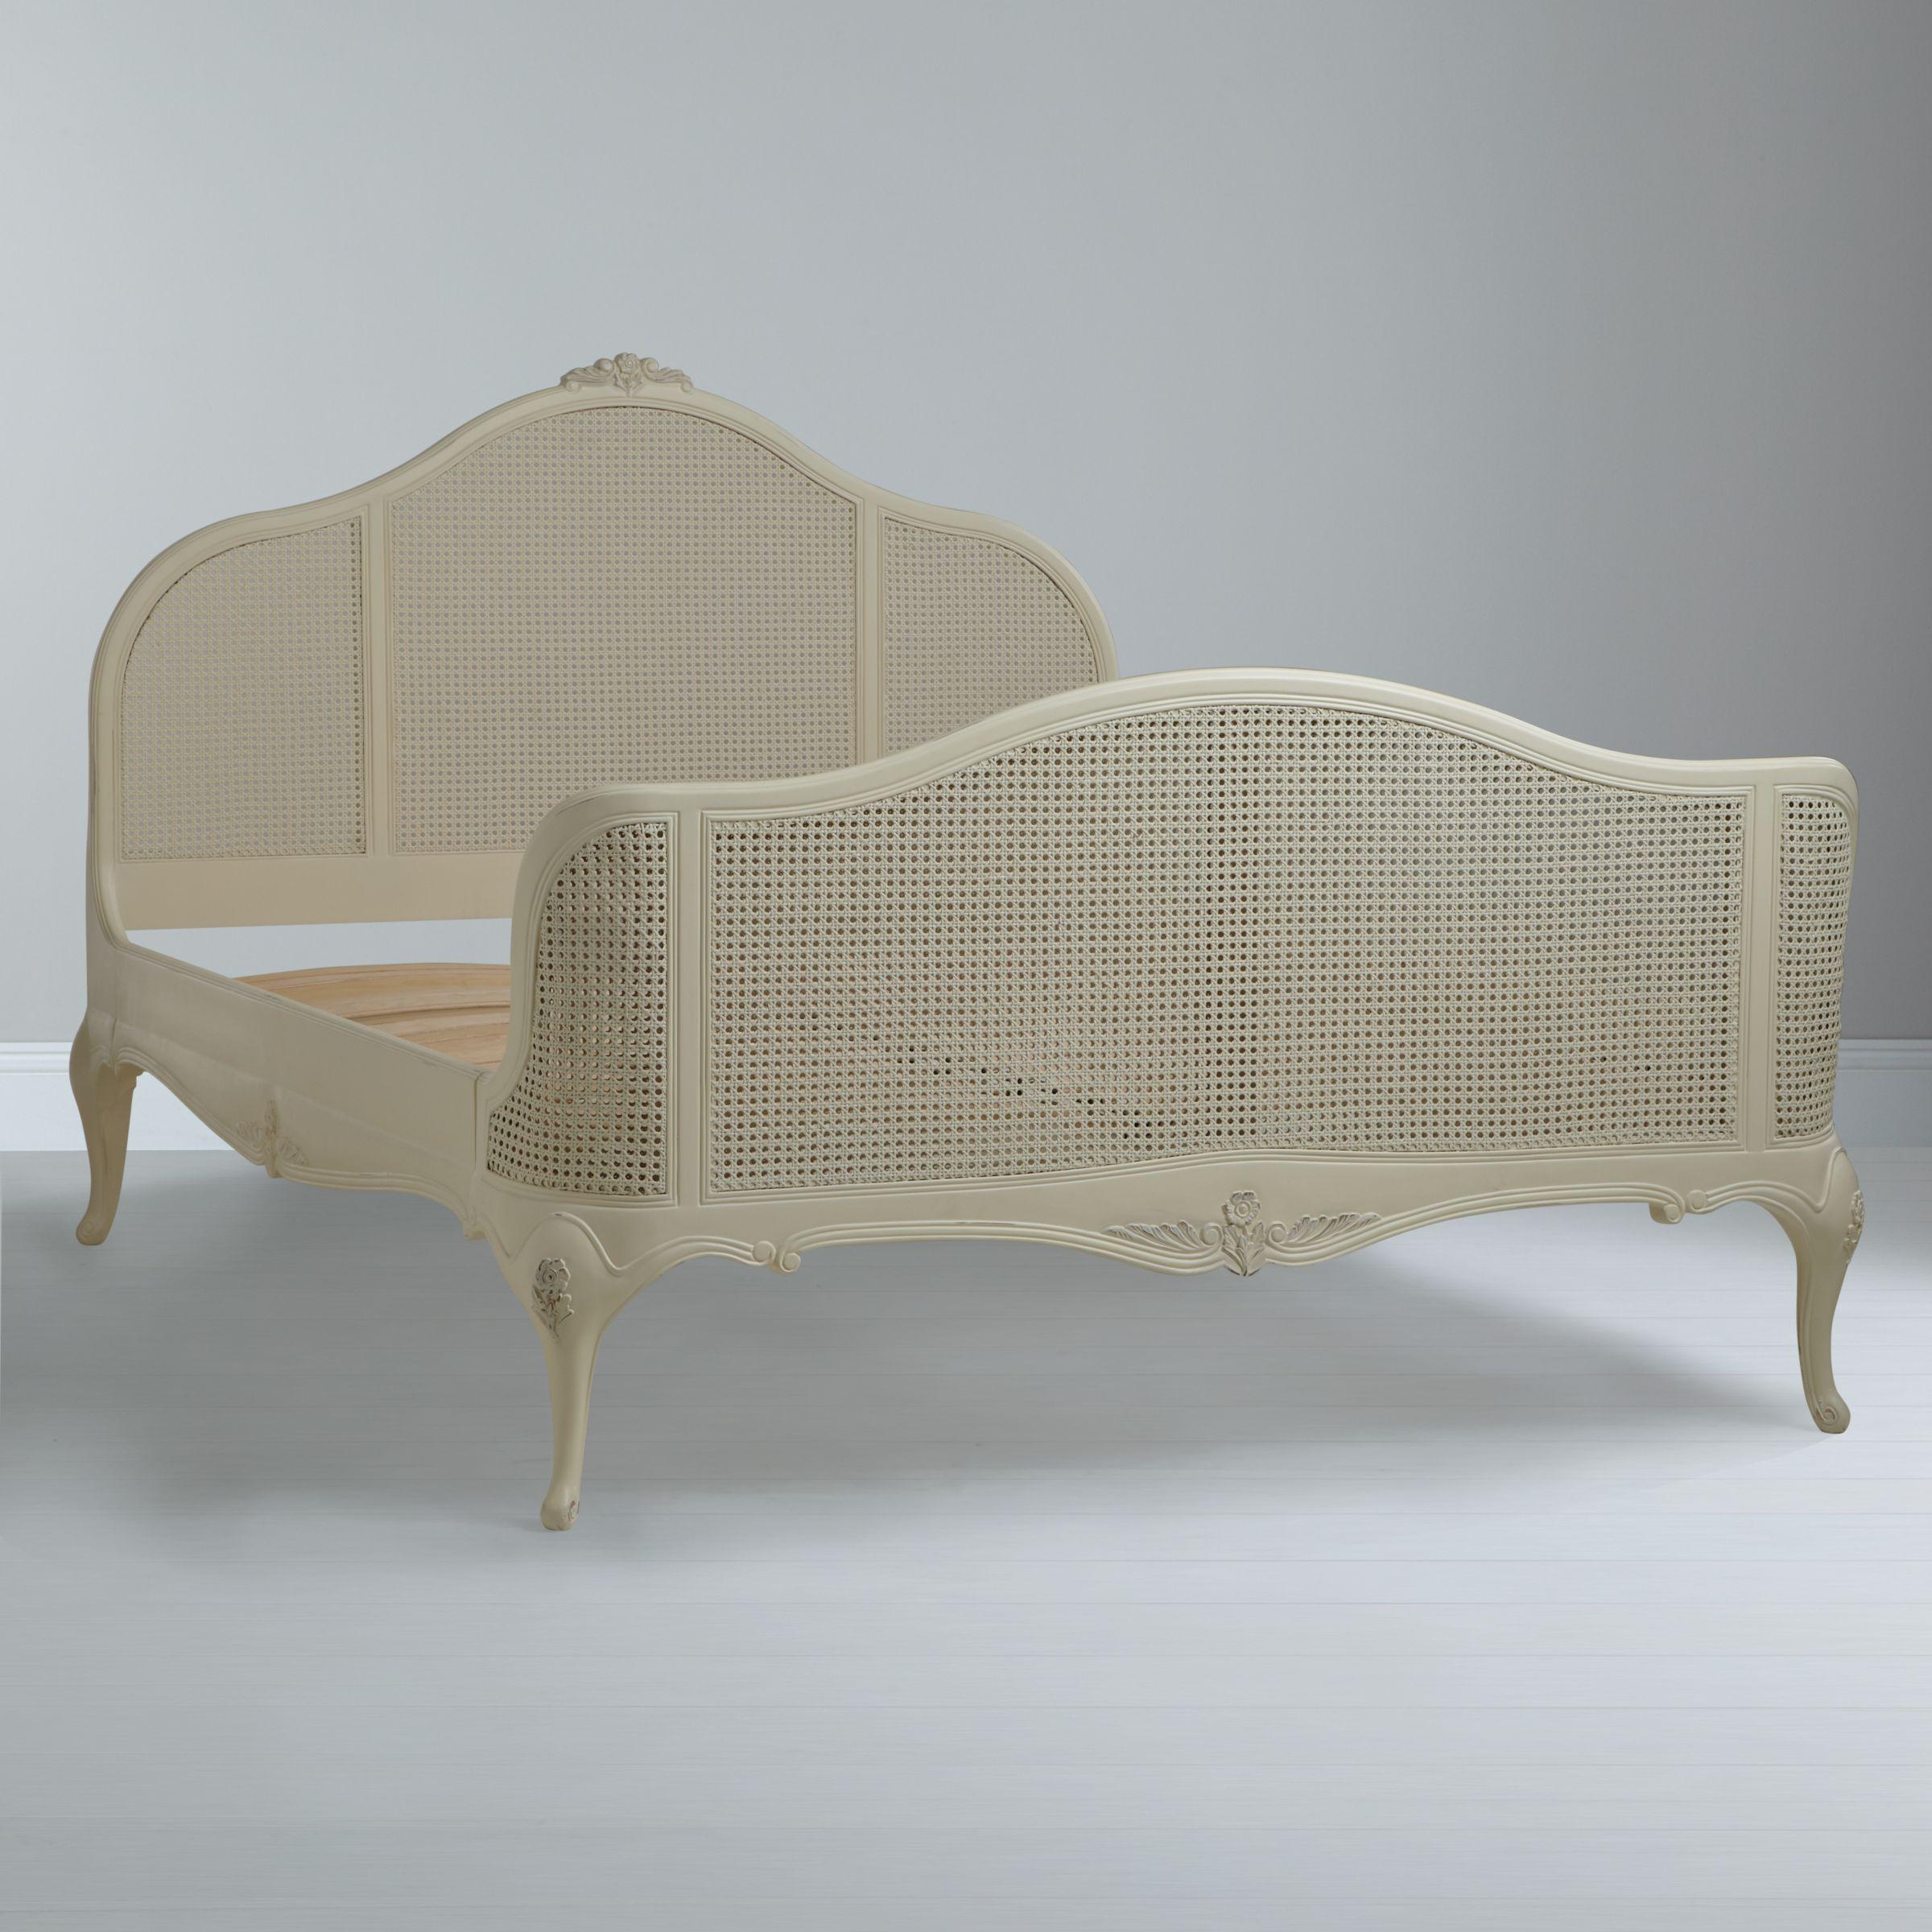 John Lewis Rose Rattan Bed Frame Super King Size Ivory At John Lewis Partners